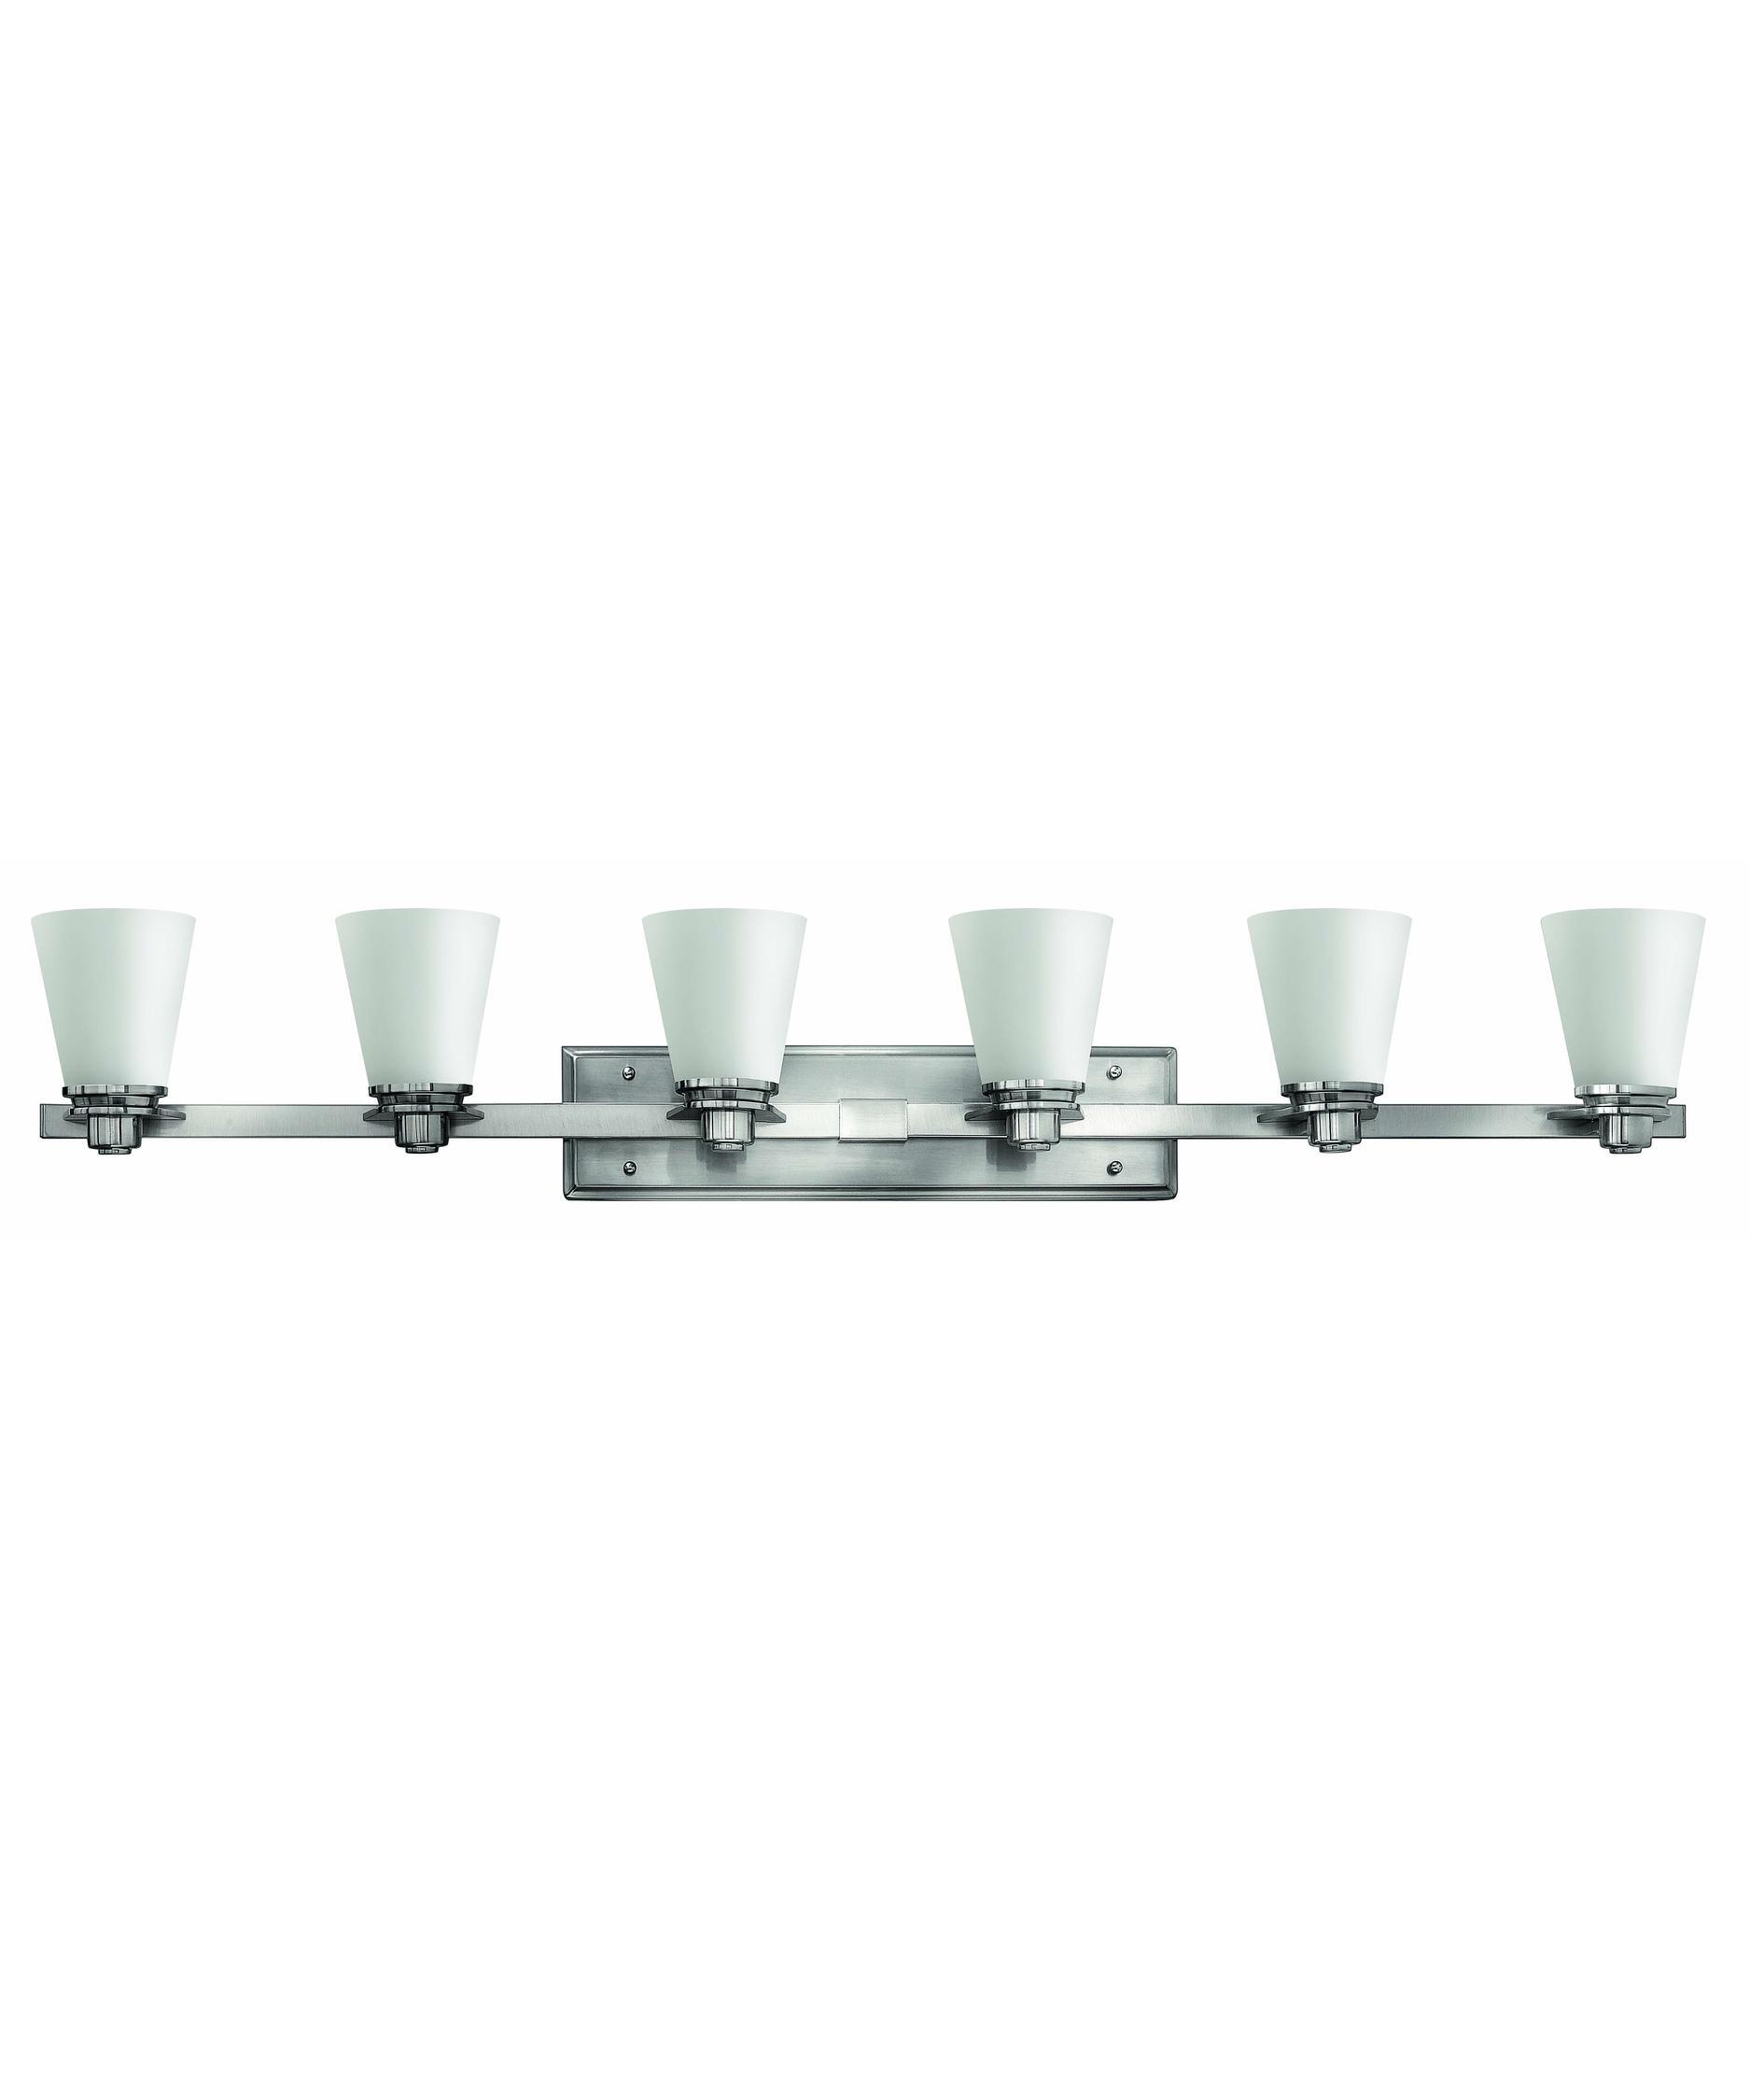 Bathroom Light Fixtures Brushed Nickel 48 Inches hinkley lighting 5556 avon 48 inch wide bath vanity light